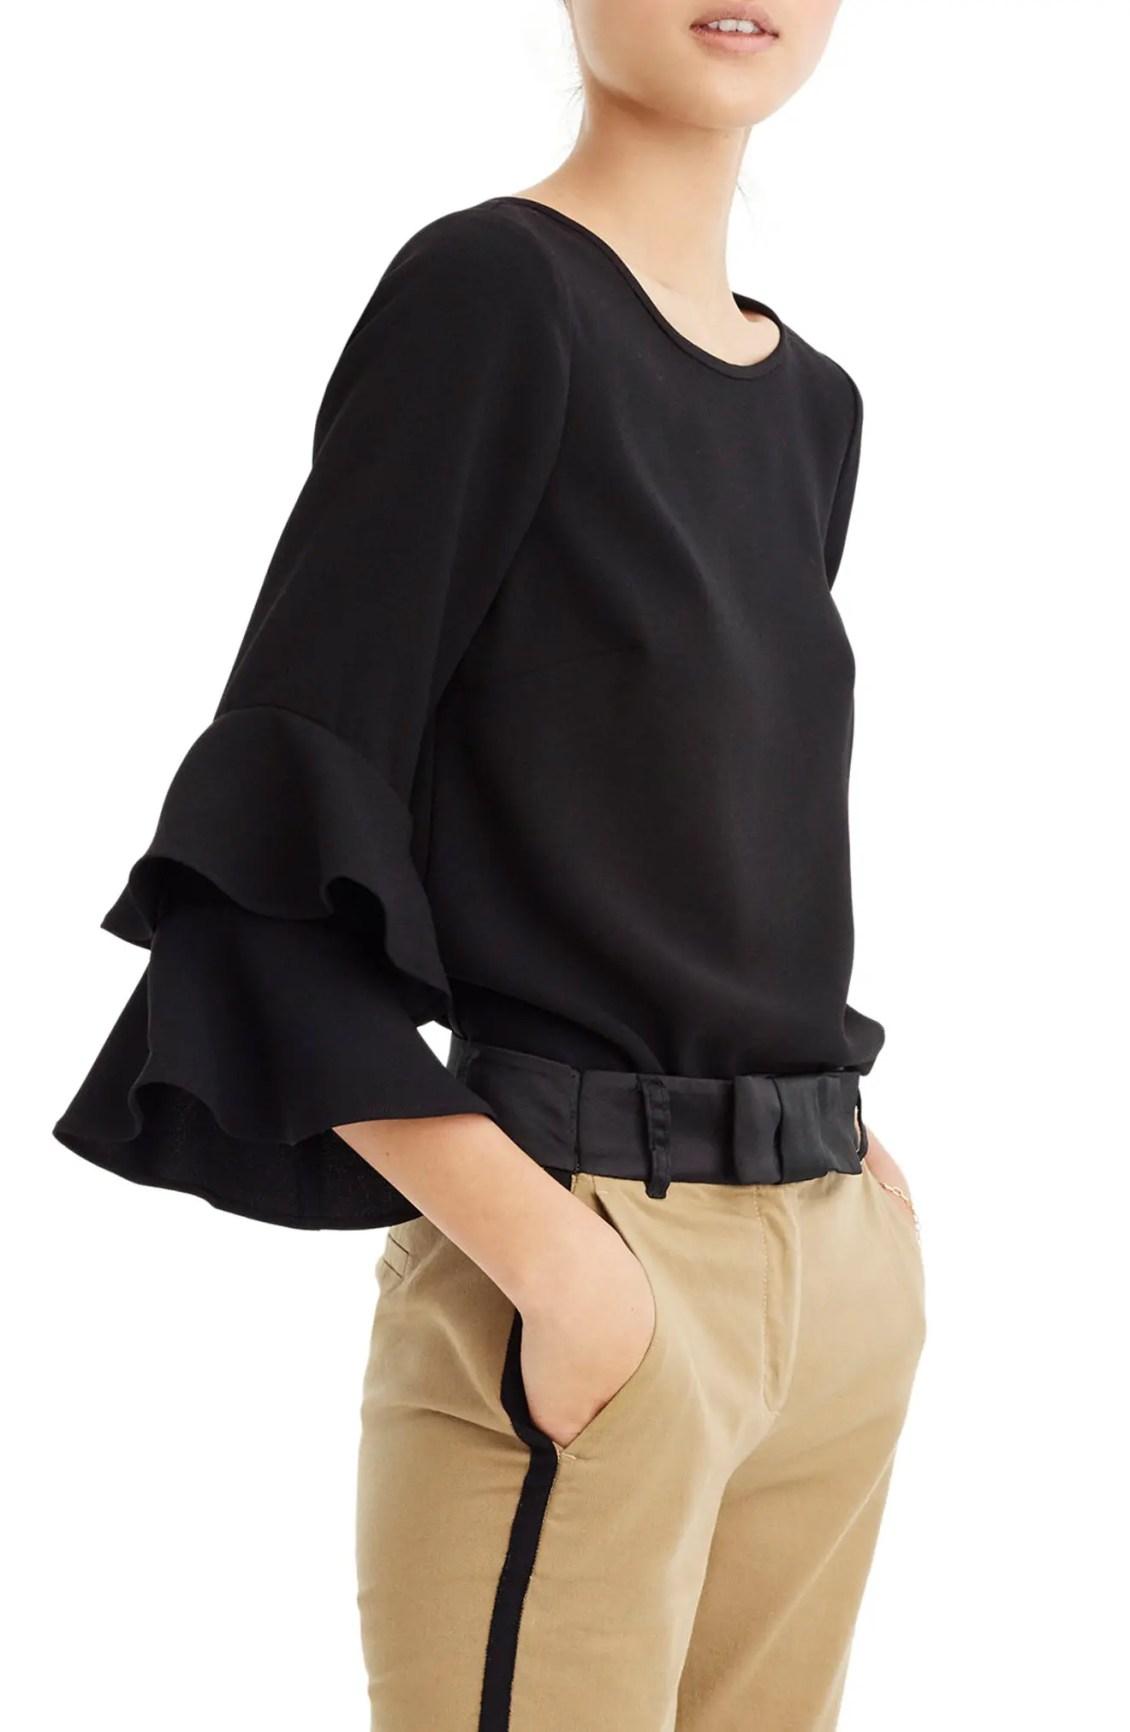 Main Image - J.Crew Lana Tiered Bell Sleeve Top (Regular & Petite)